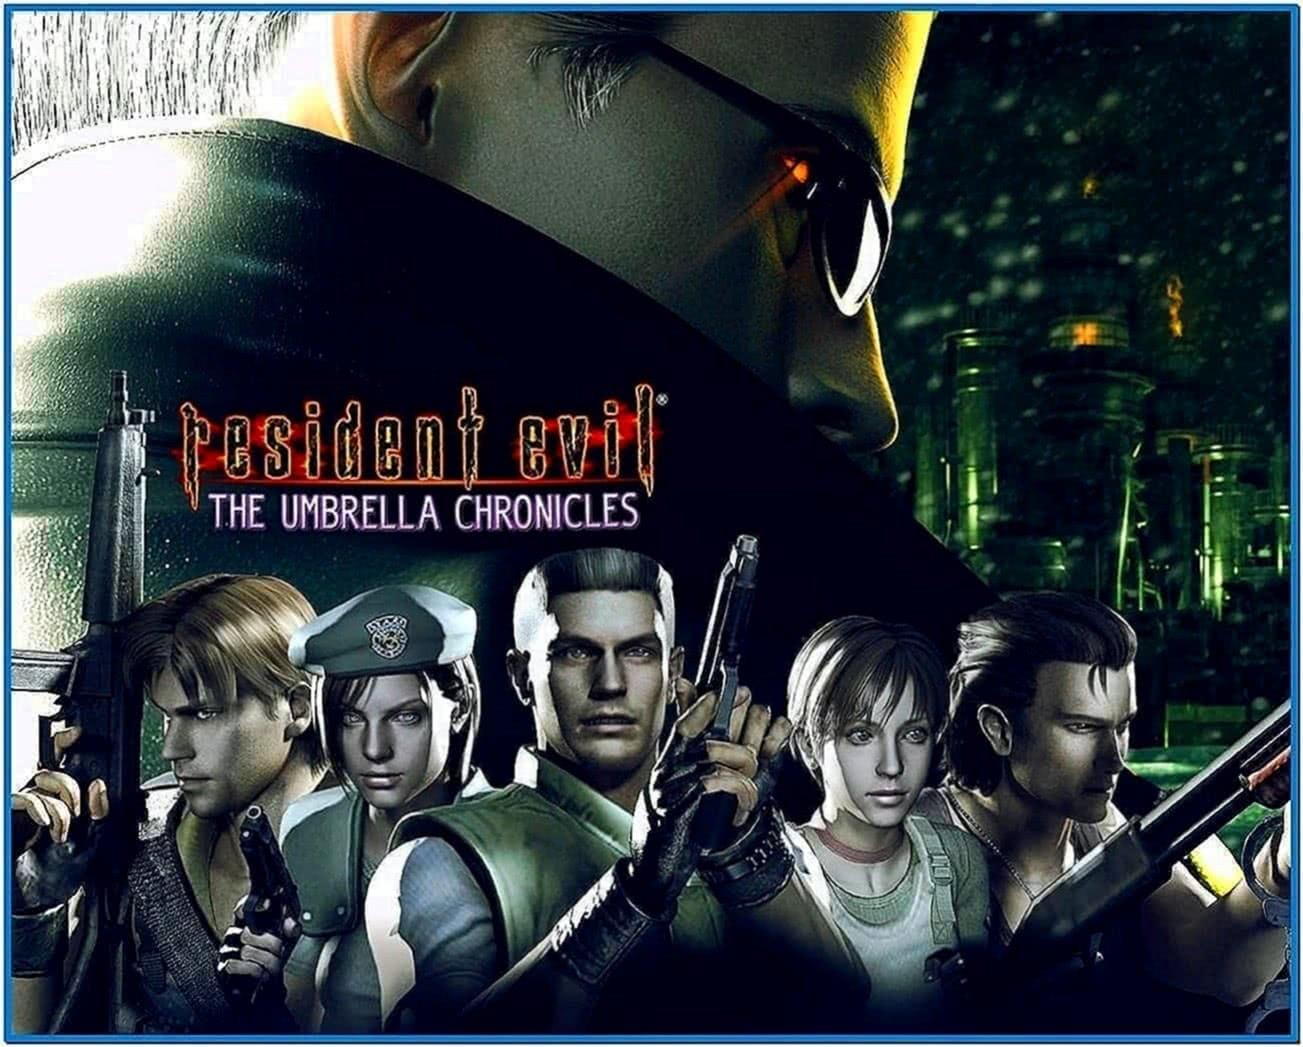 resident evil umbrella chronicles screensaver download free